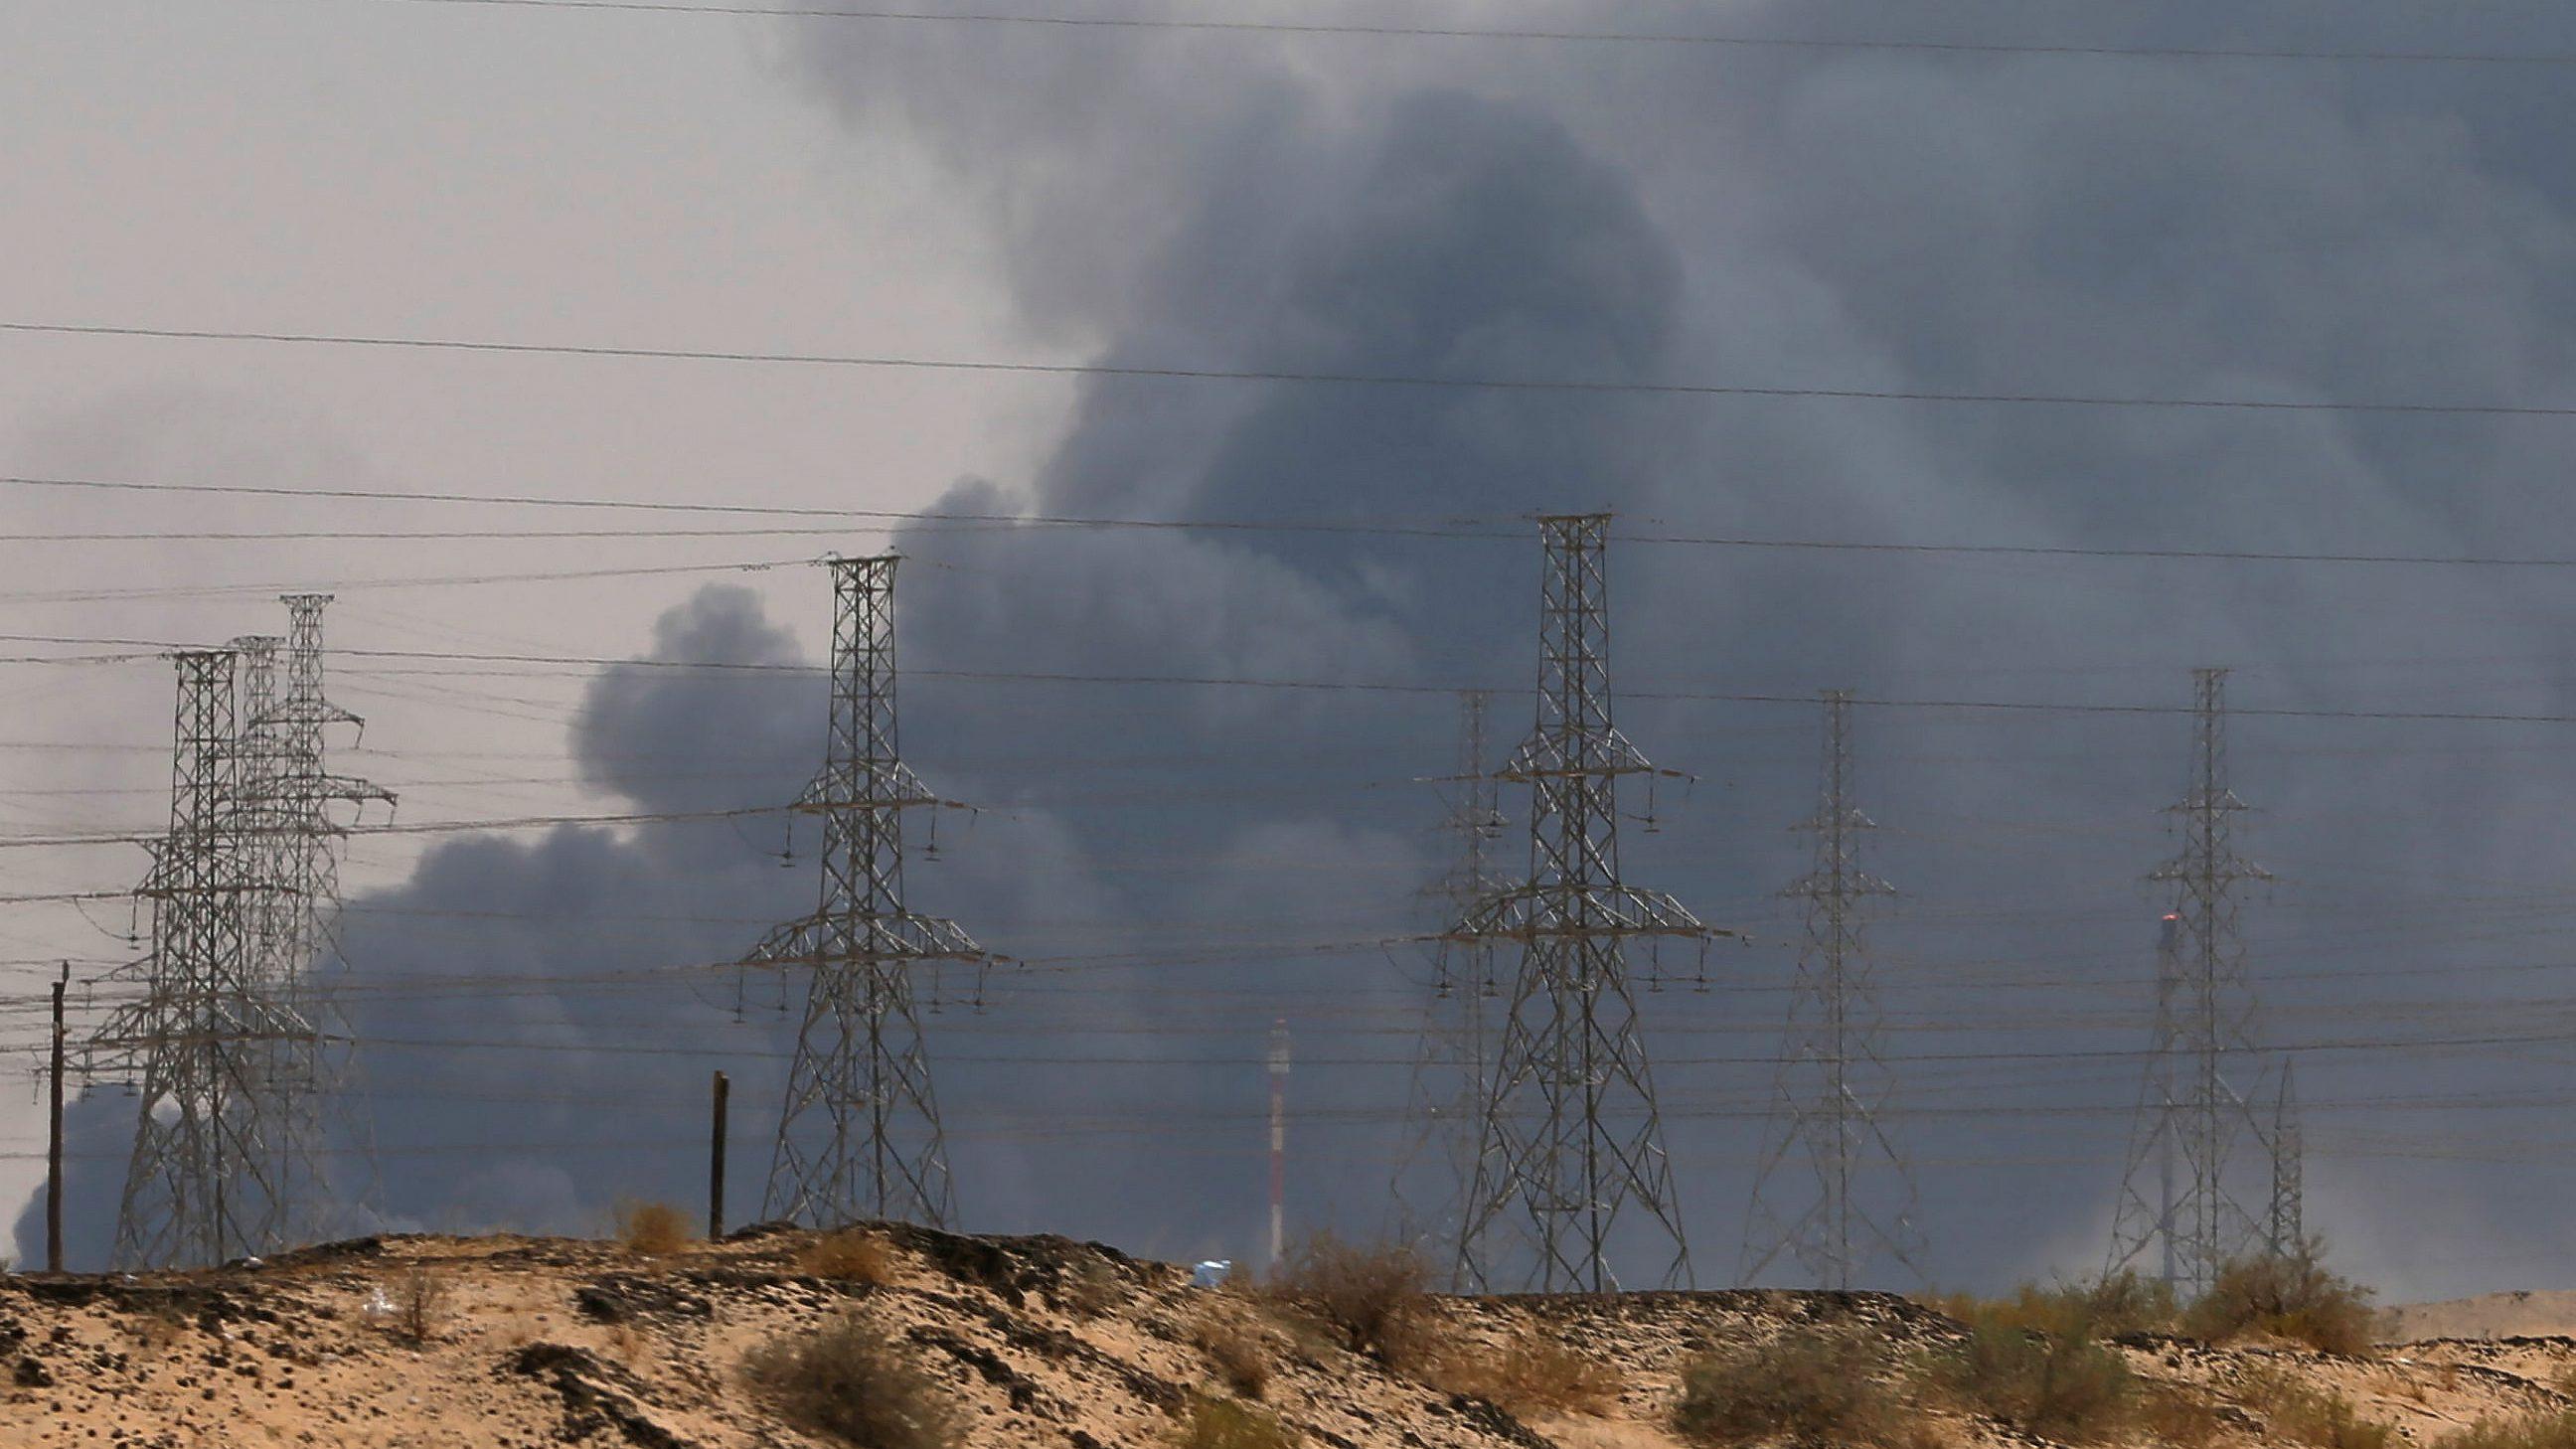 Smoke is seen following a fire at an Aramco factory in Abqaiq, Saudi Arabia, September 14, 2019.